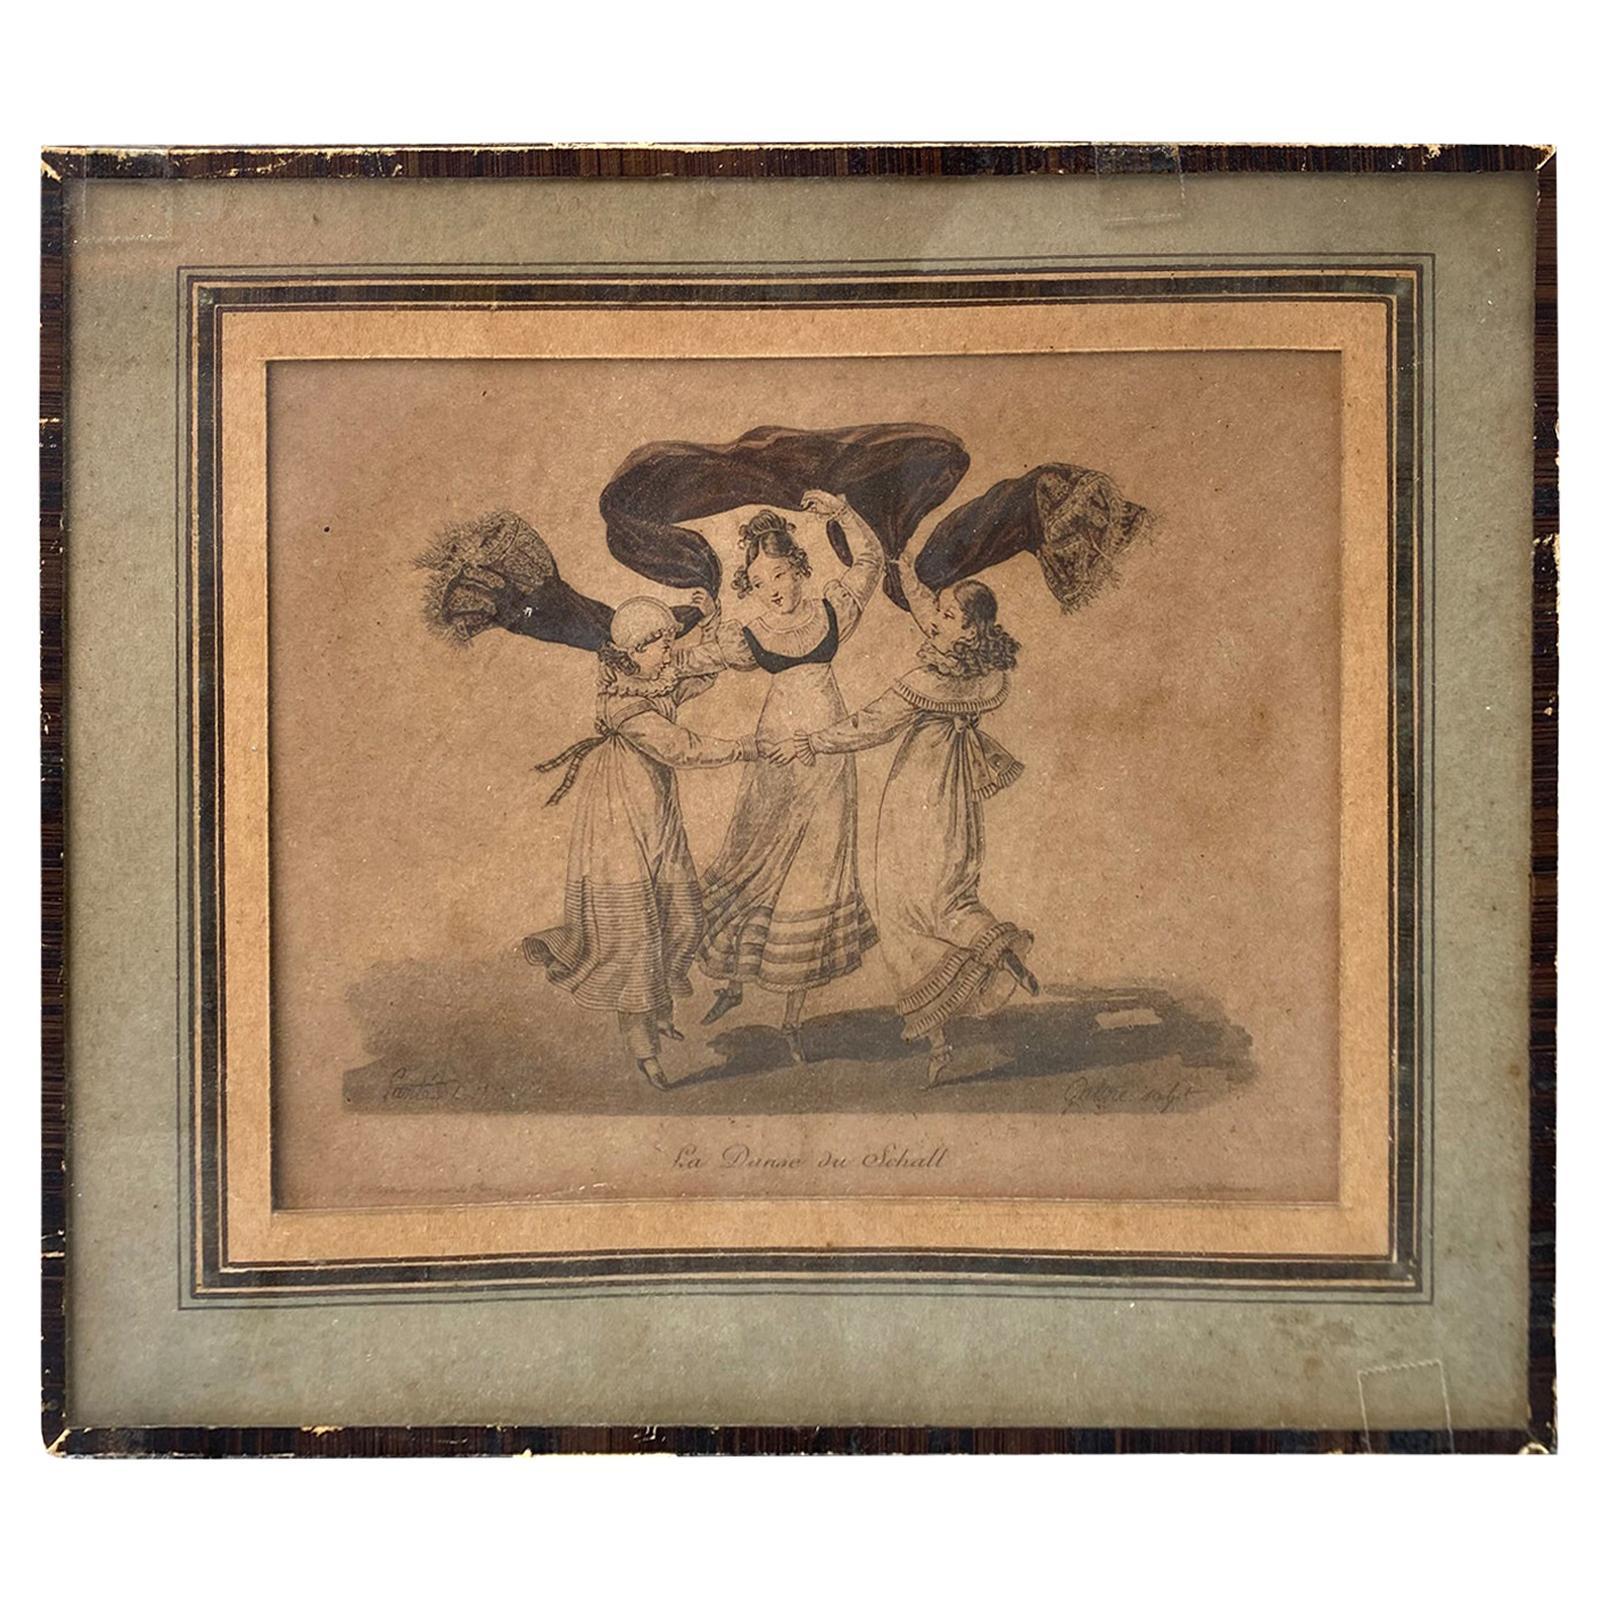 """La Danse du Chall"" Engraving After Original Print of c.1822 by Georges Gatine"